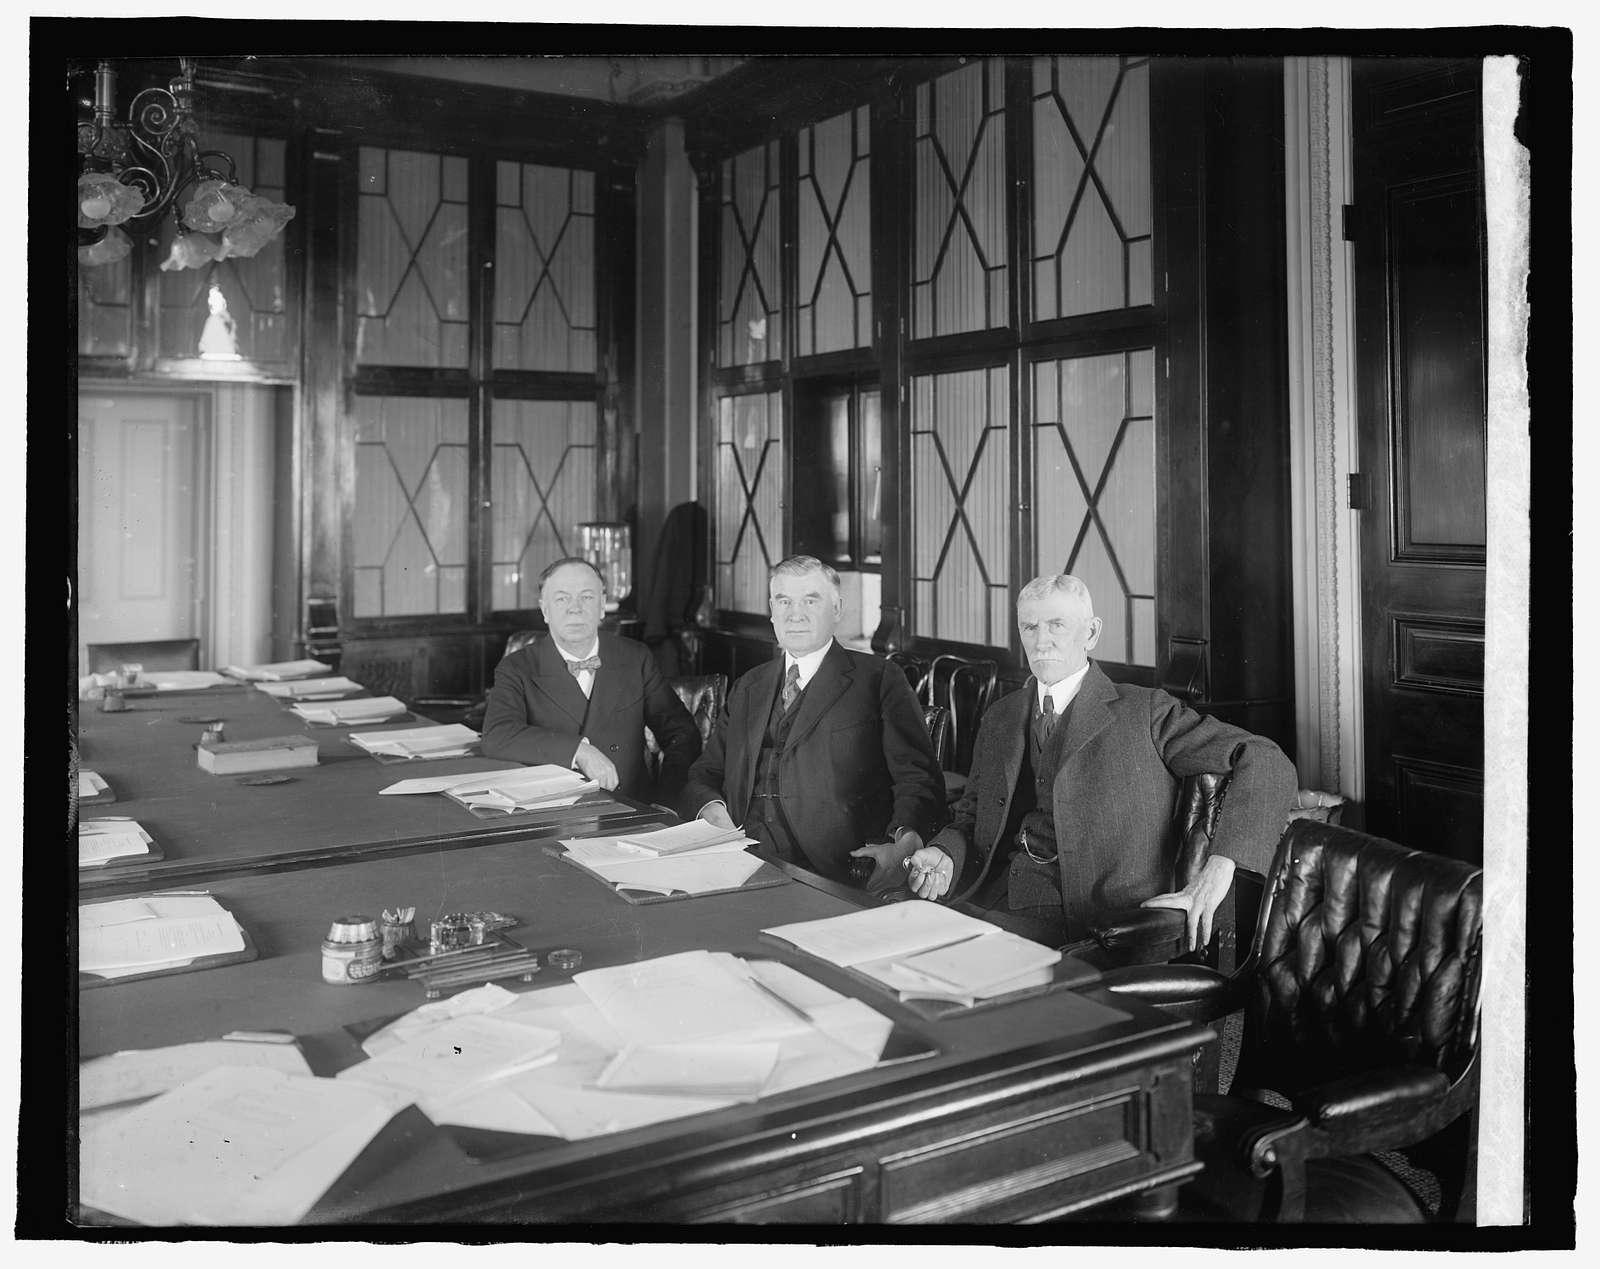 Senators Geo. E. Chamberlain, Chas. S. Thomas of Colo., Jas. H. Brady of Idaho